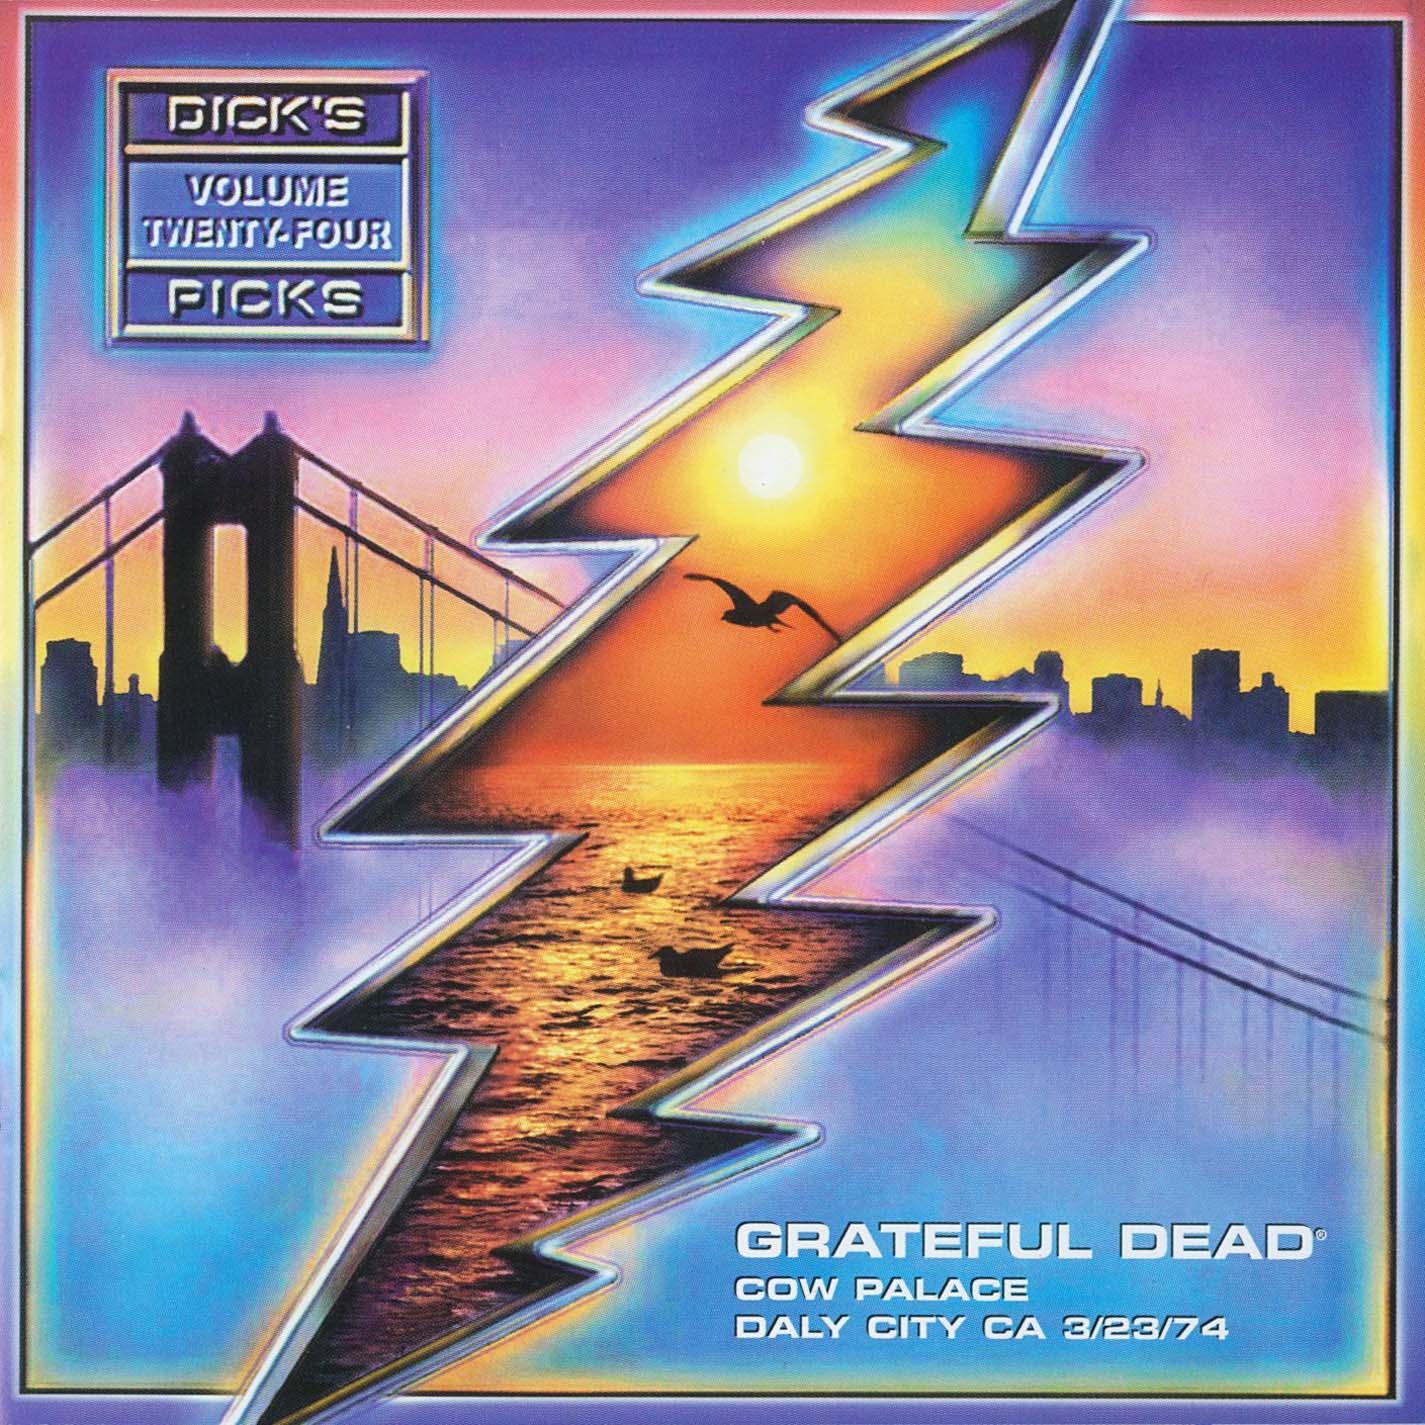 Grateful Dead Dick's Picks 24 album cover artwork